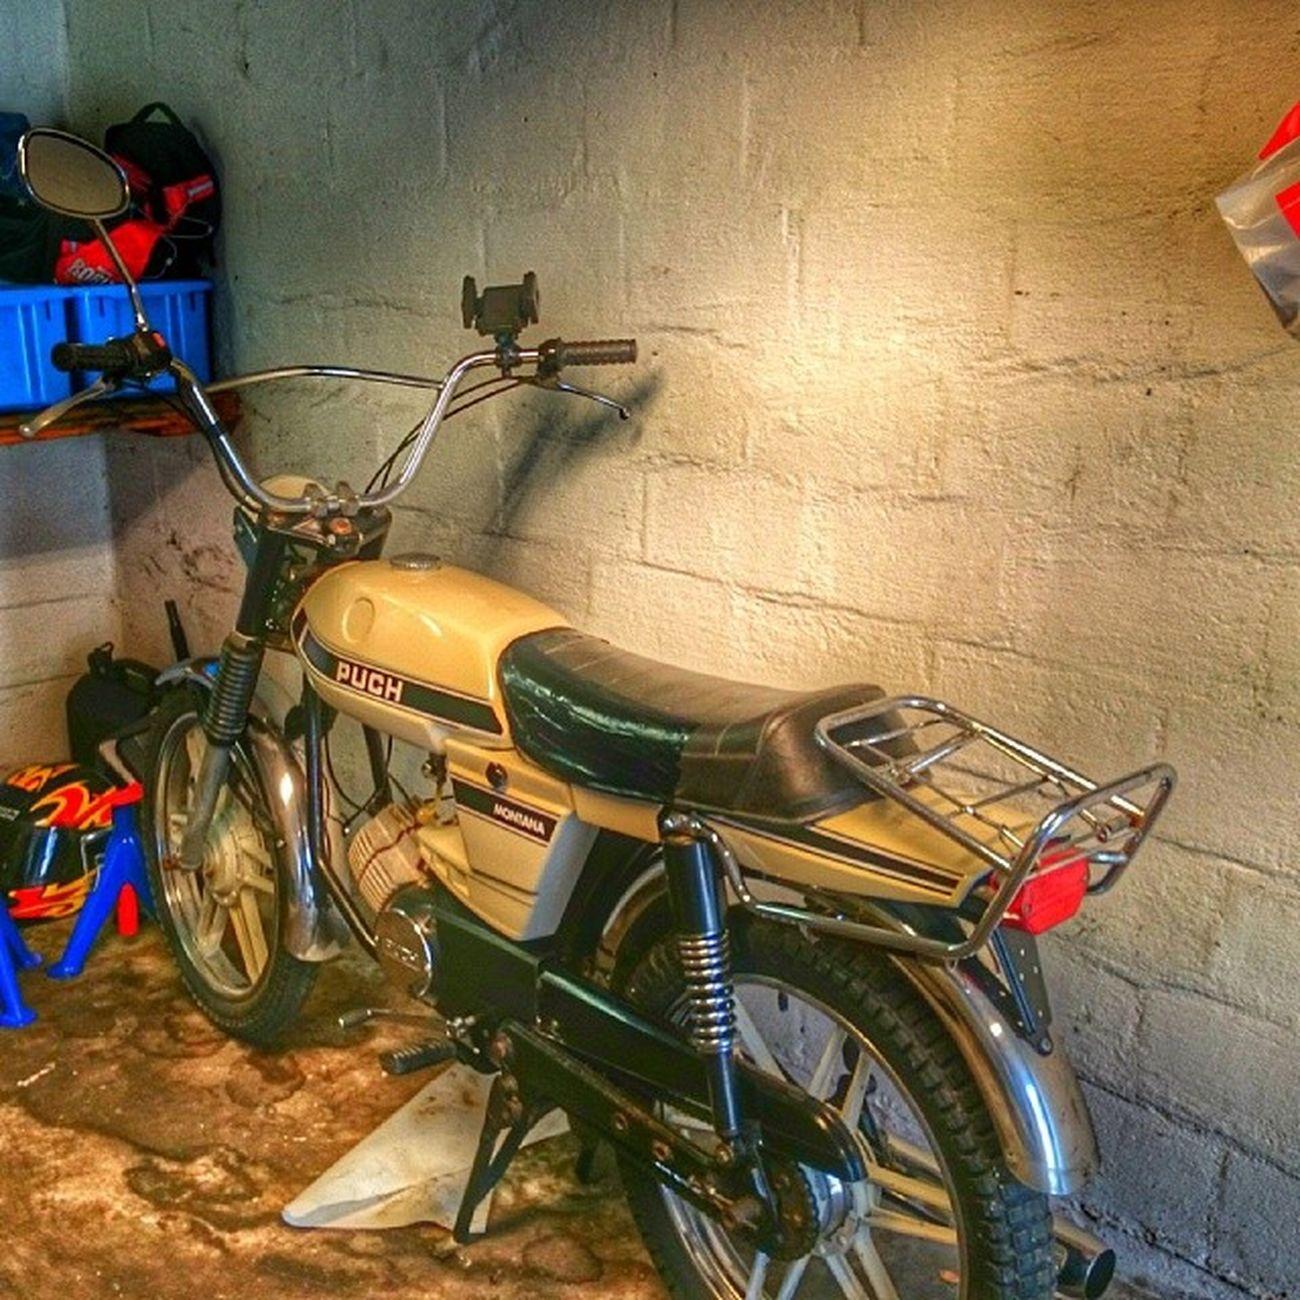 Puch Montana Moppe Moped 50cc nostalgi halmstad halland sverige sweden